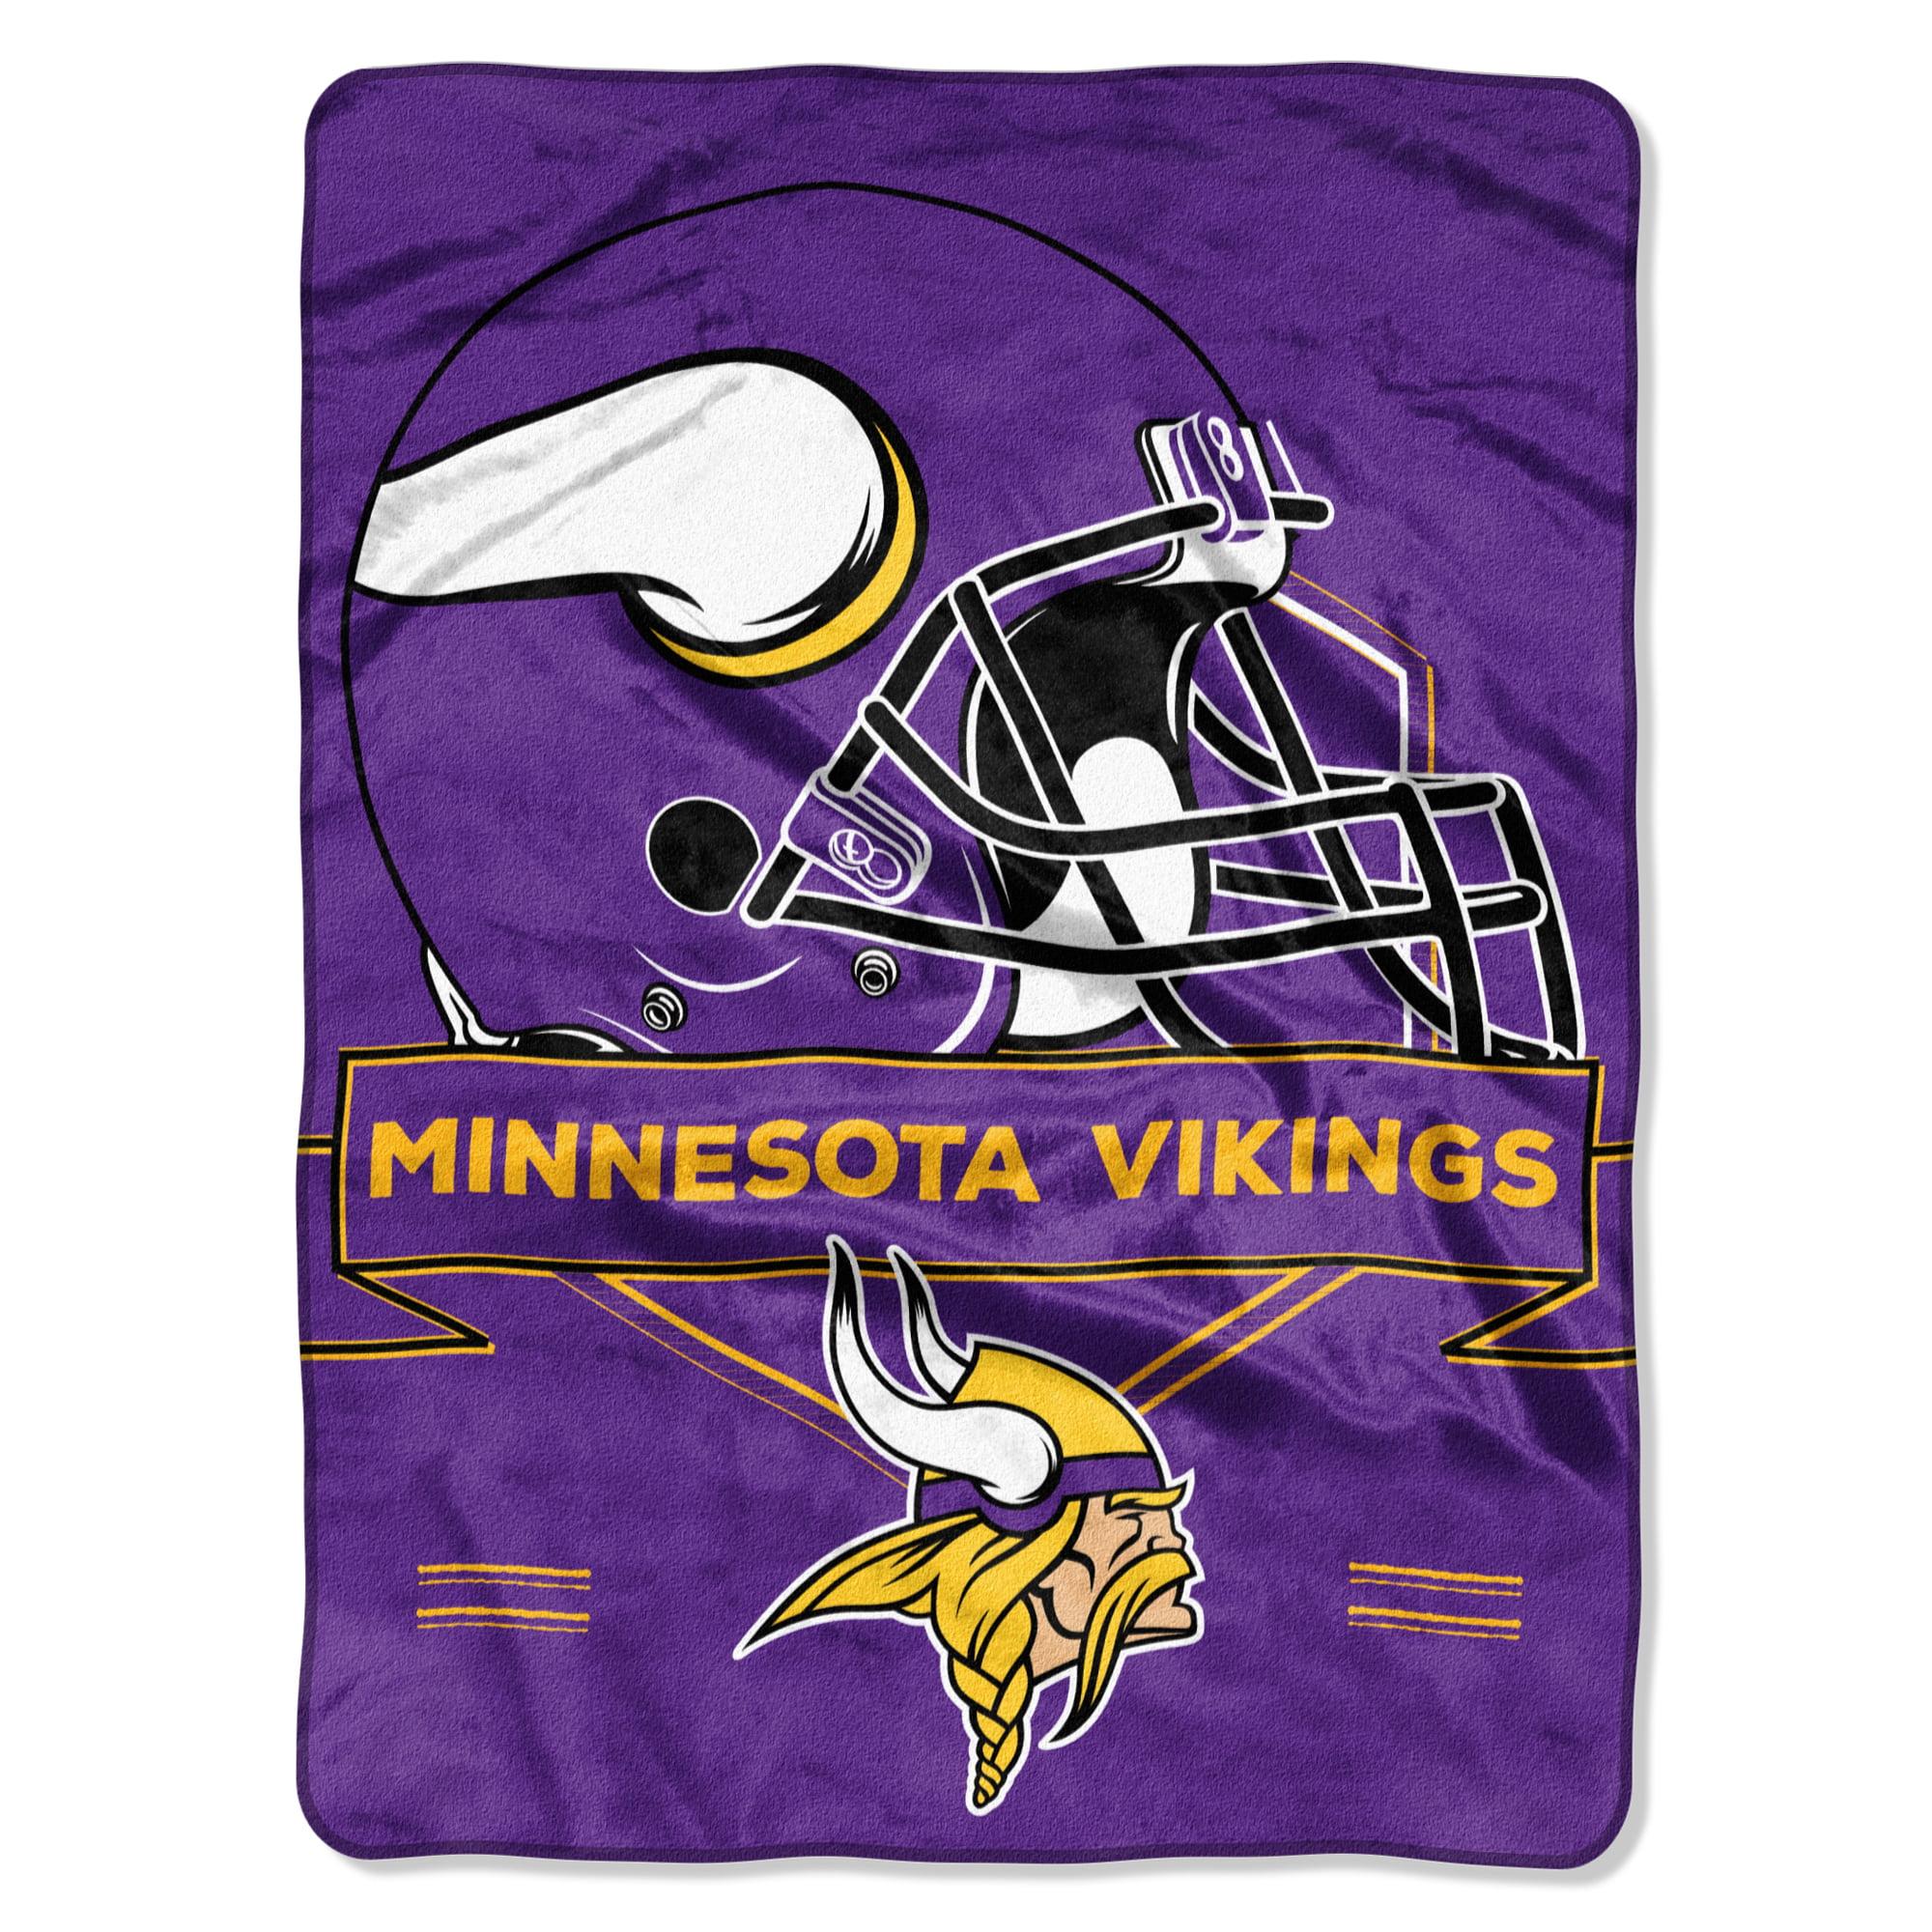 "Minnesota Vikings The Northwest Company 60"" x 80"" Prestige Raschel Blanket - No Size"